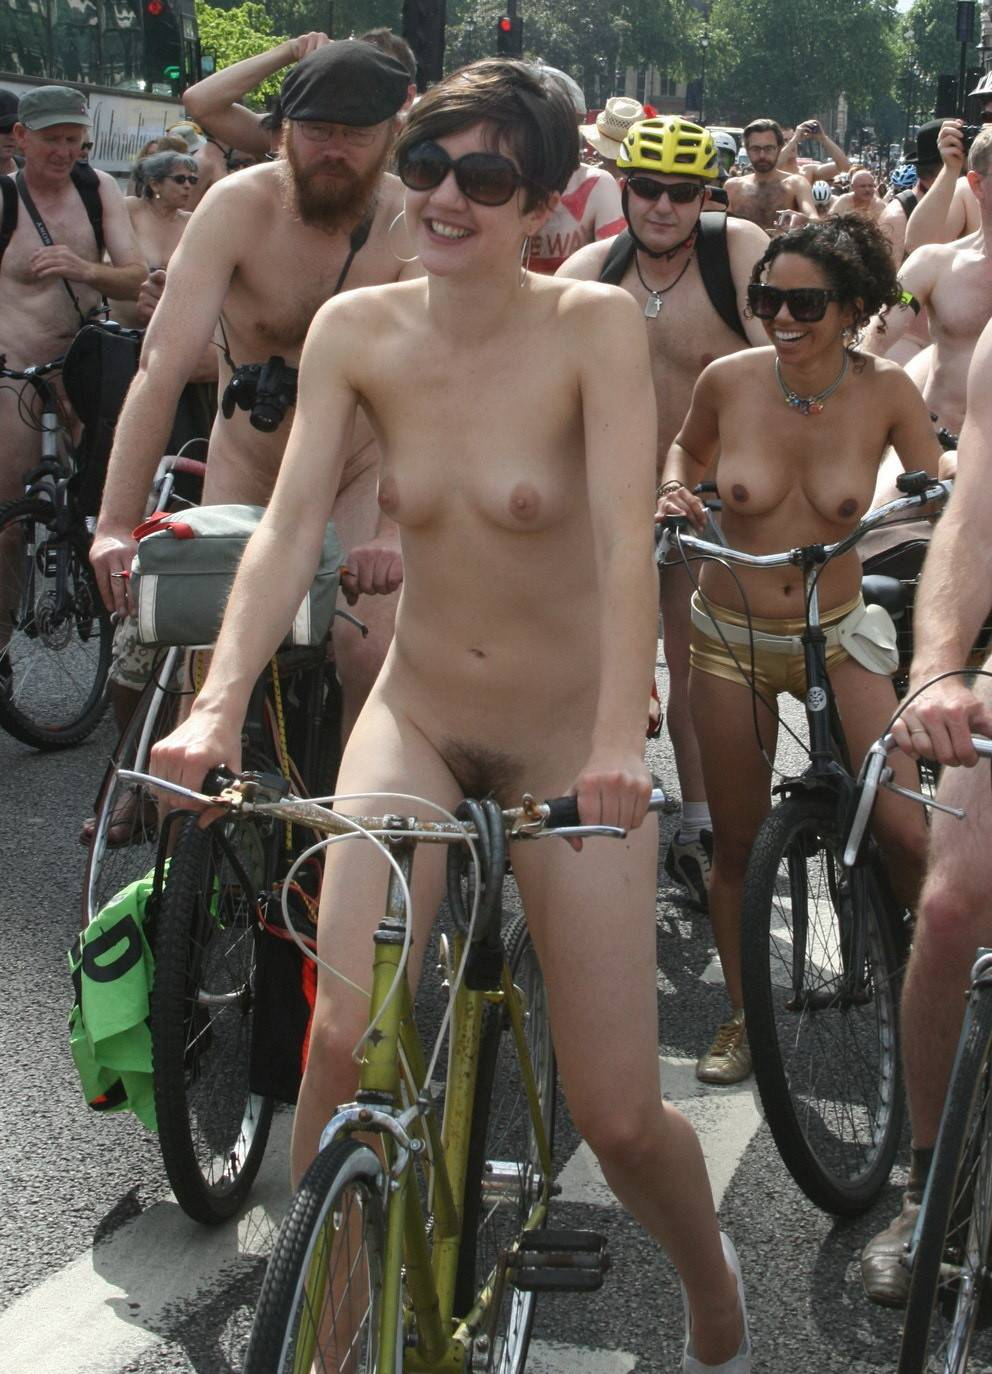 Join nudist group